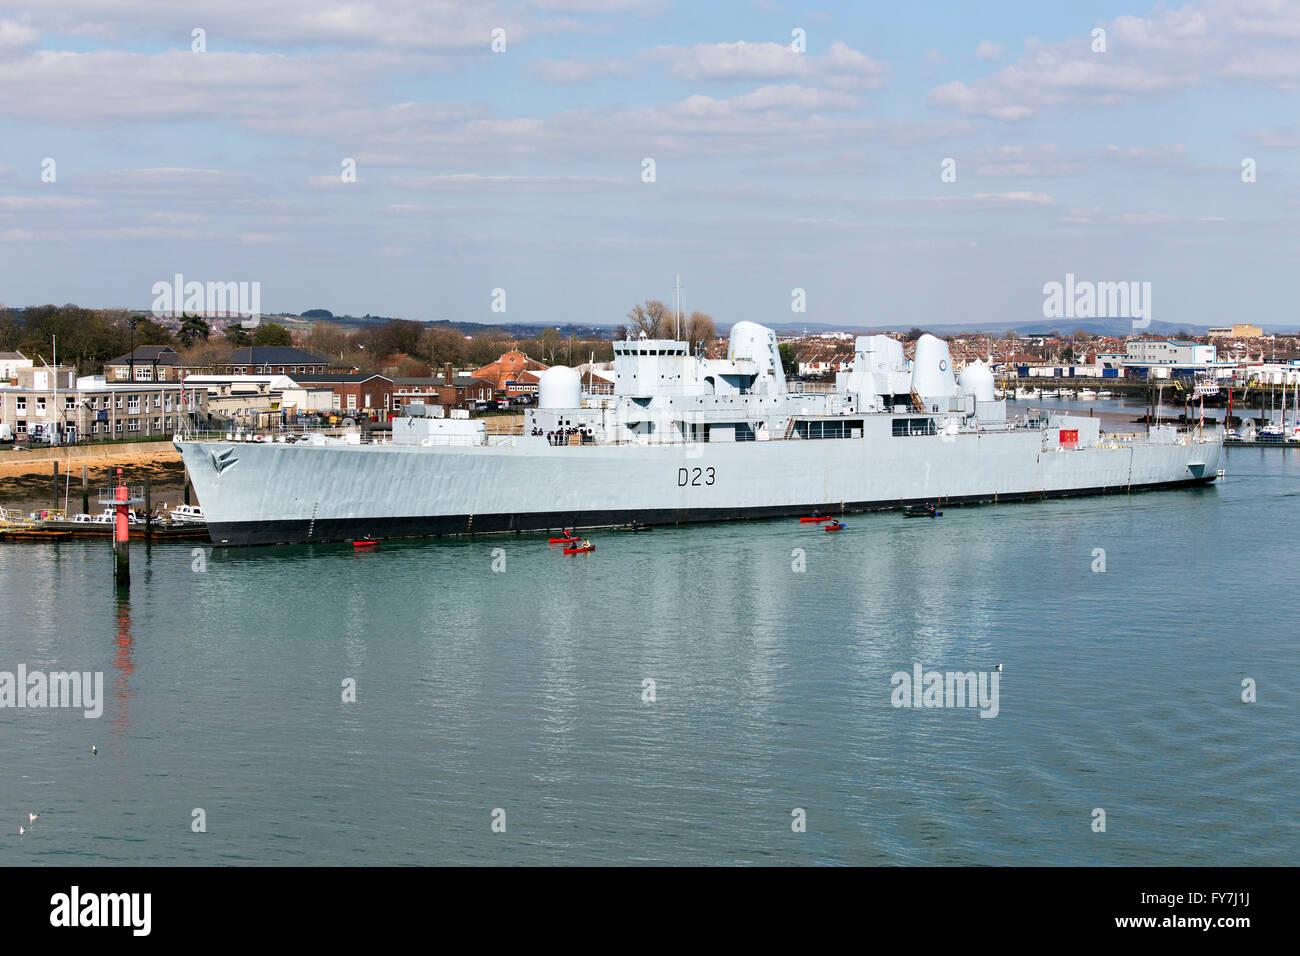 Navy ship - Stock Image